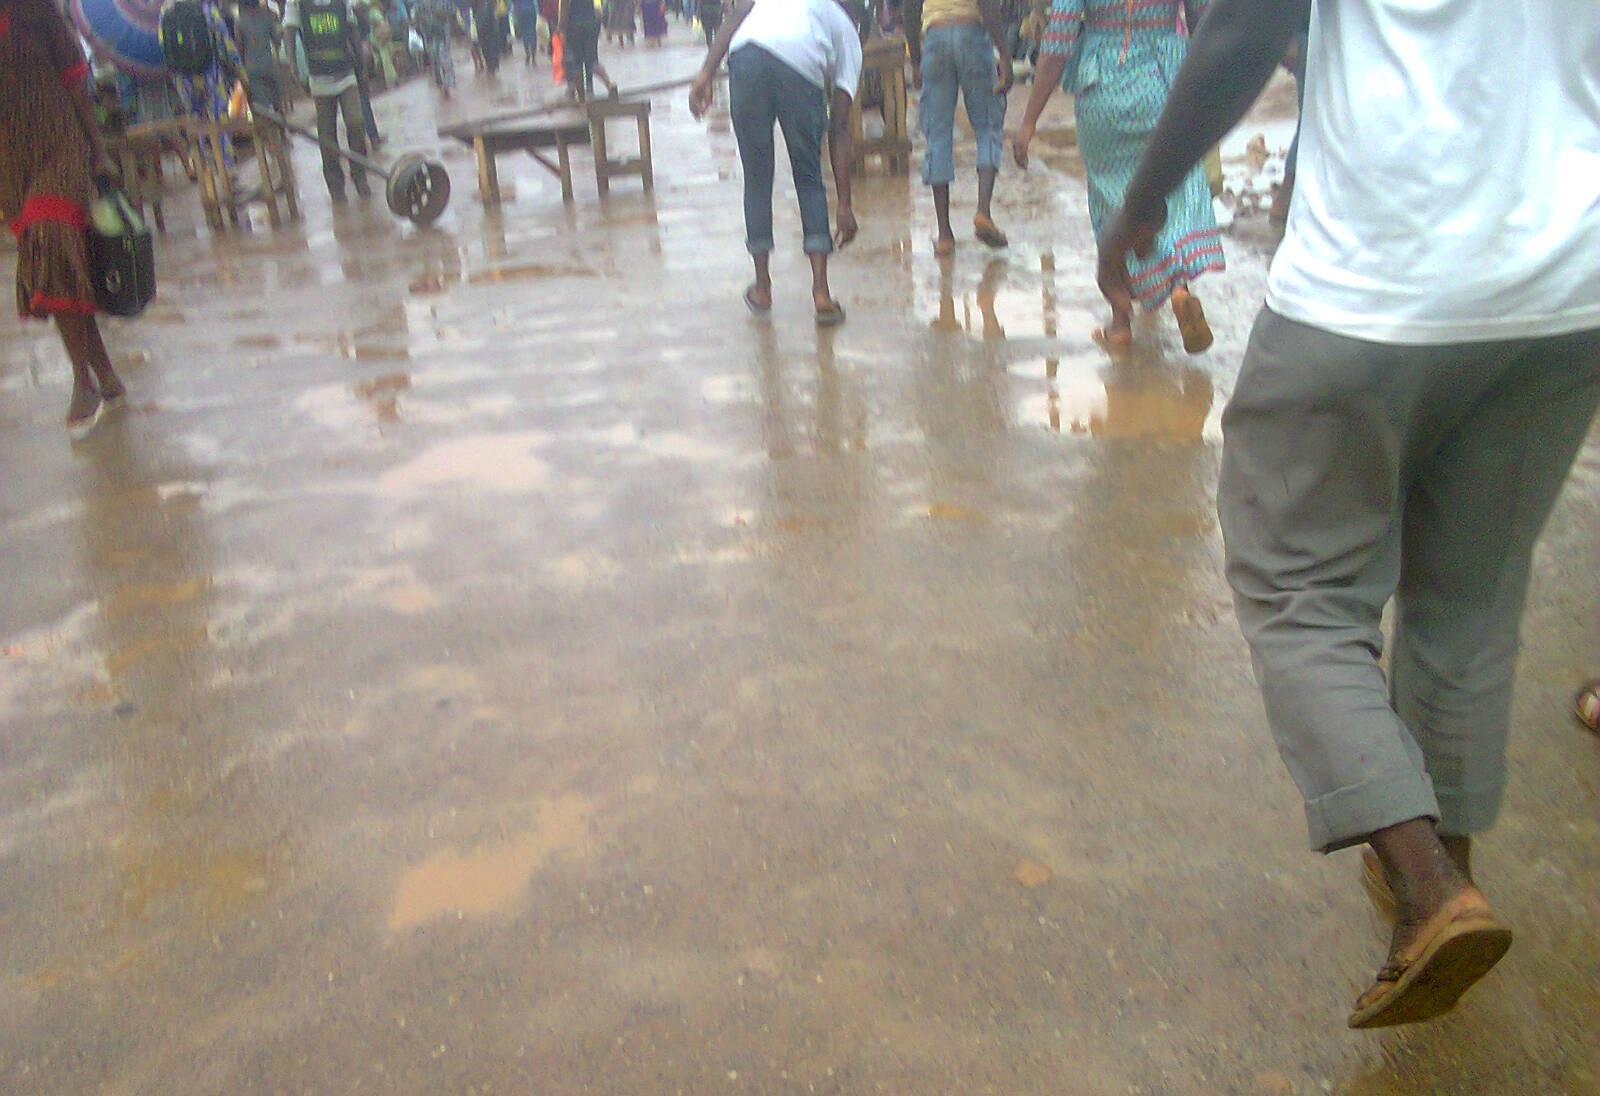 Igando commuters running around the scene of the incident